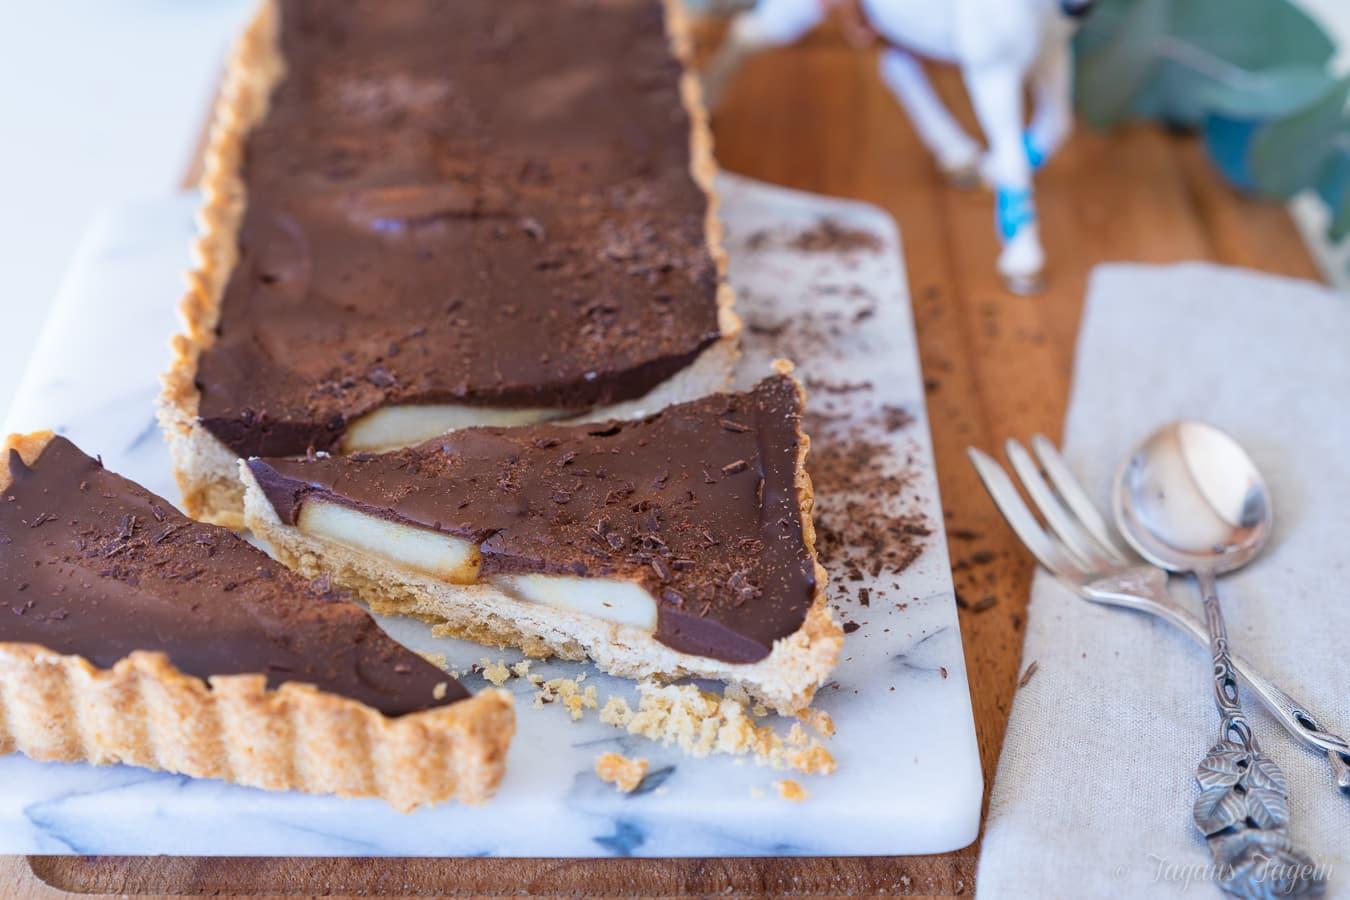 Birnen Schokoladen Tarte